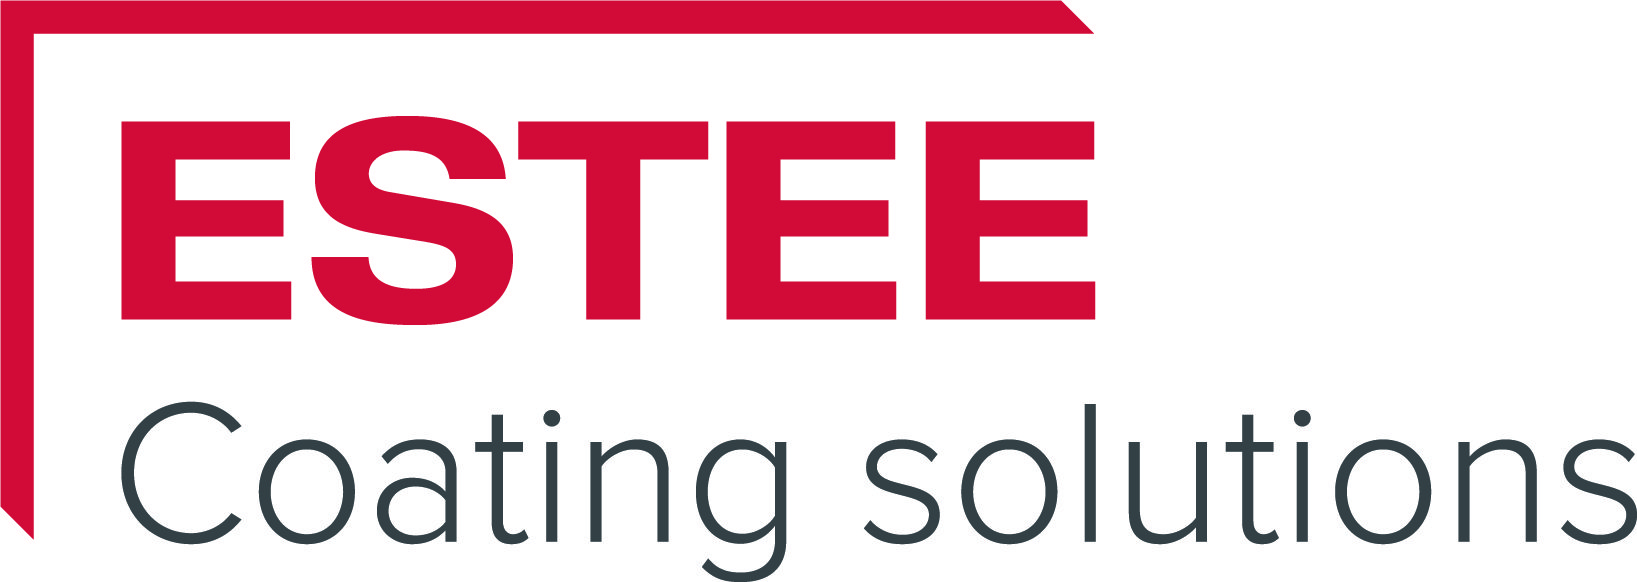 ESTEE Coating Solutions logo